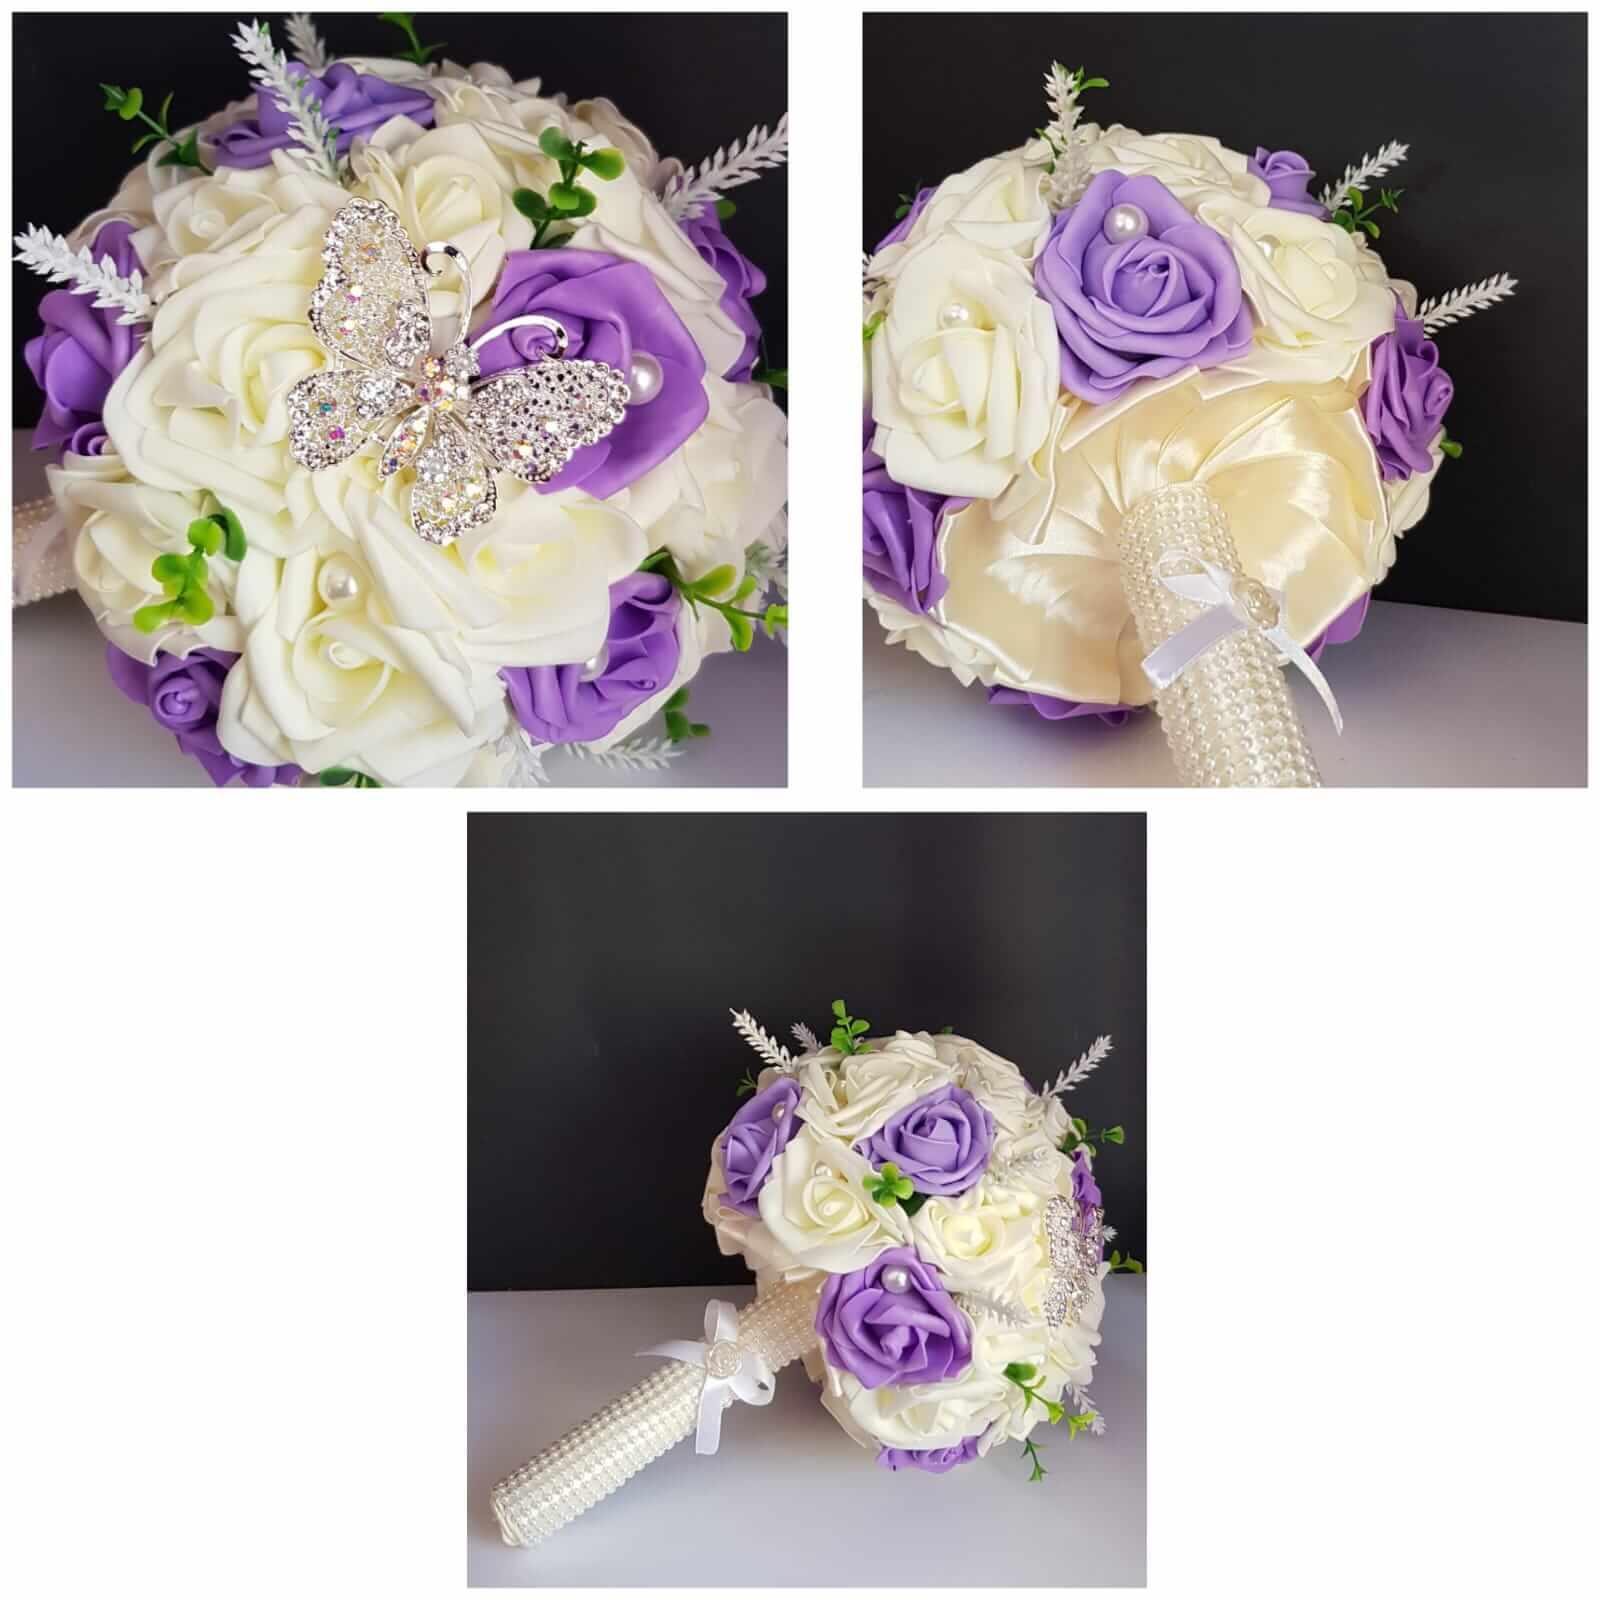 ramo de novia ramo de novia - ramos novia 7 - Ramo de novia